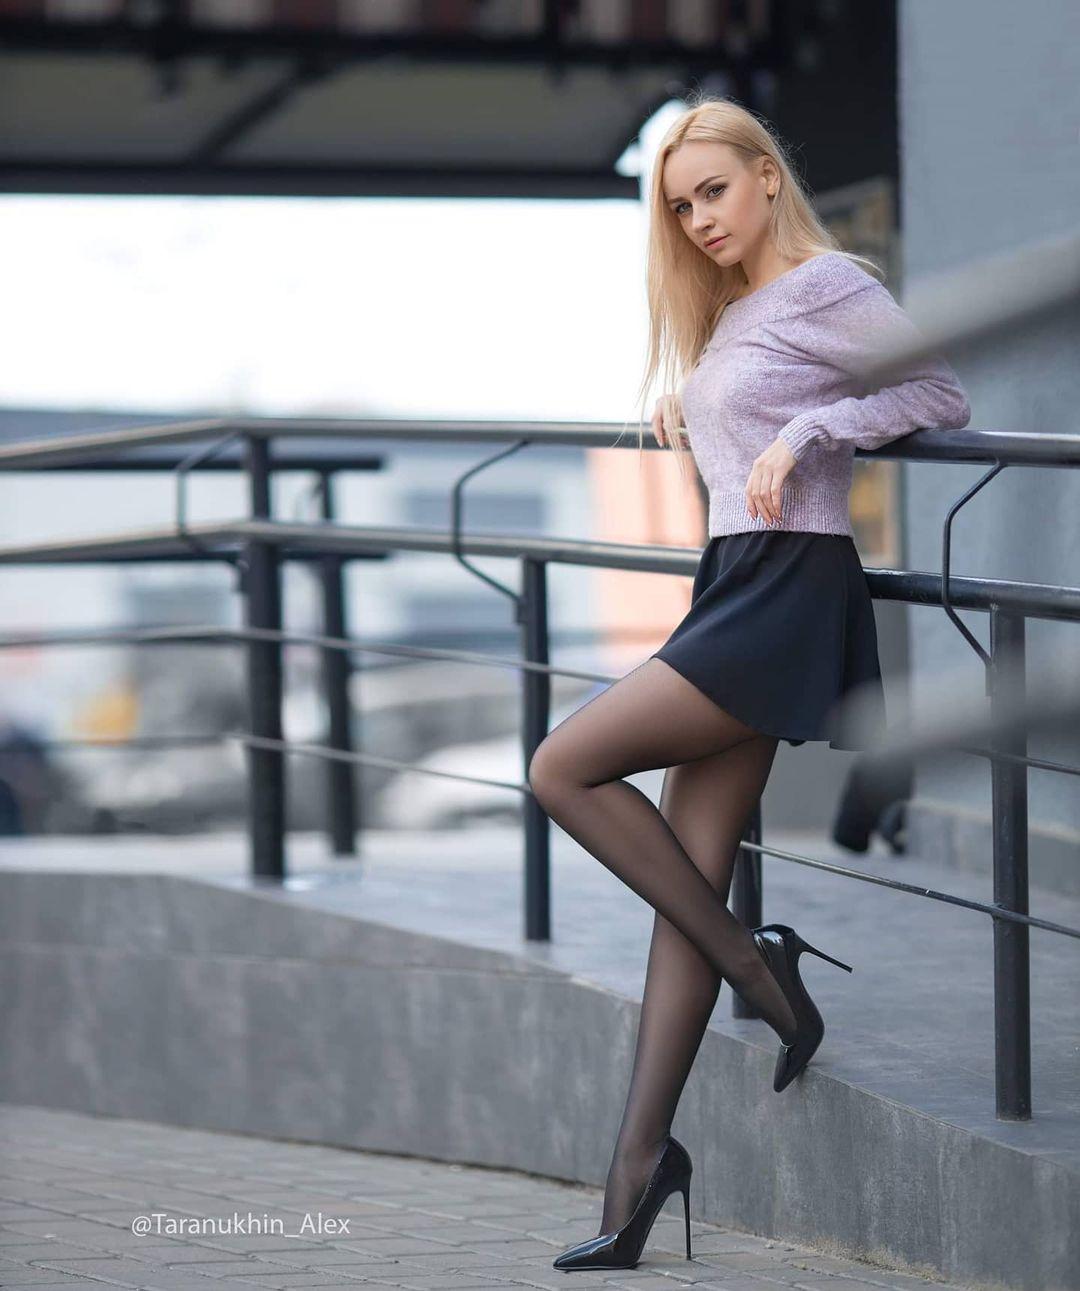 evgenia_taranukhina's_sexy_feets_on_instagram_22